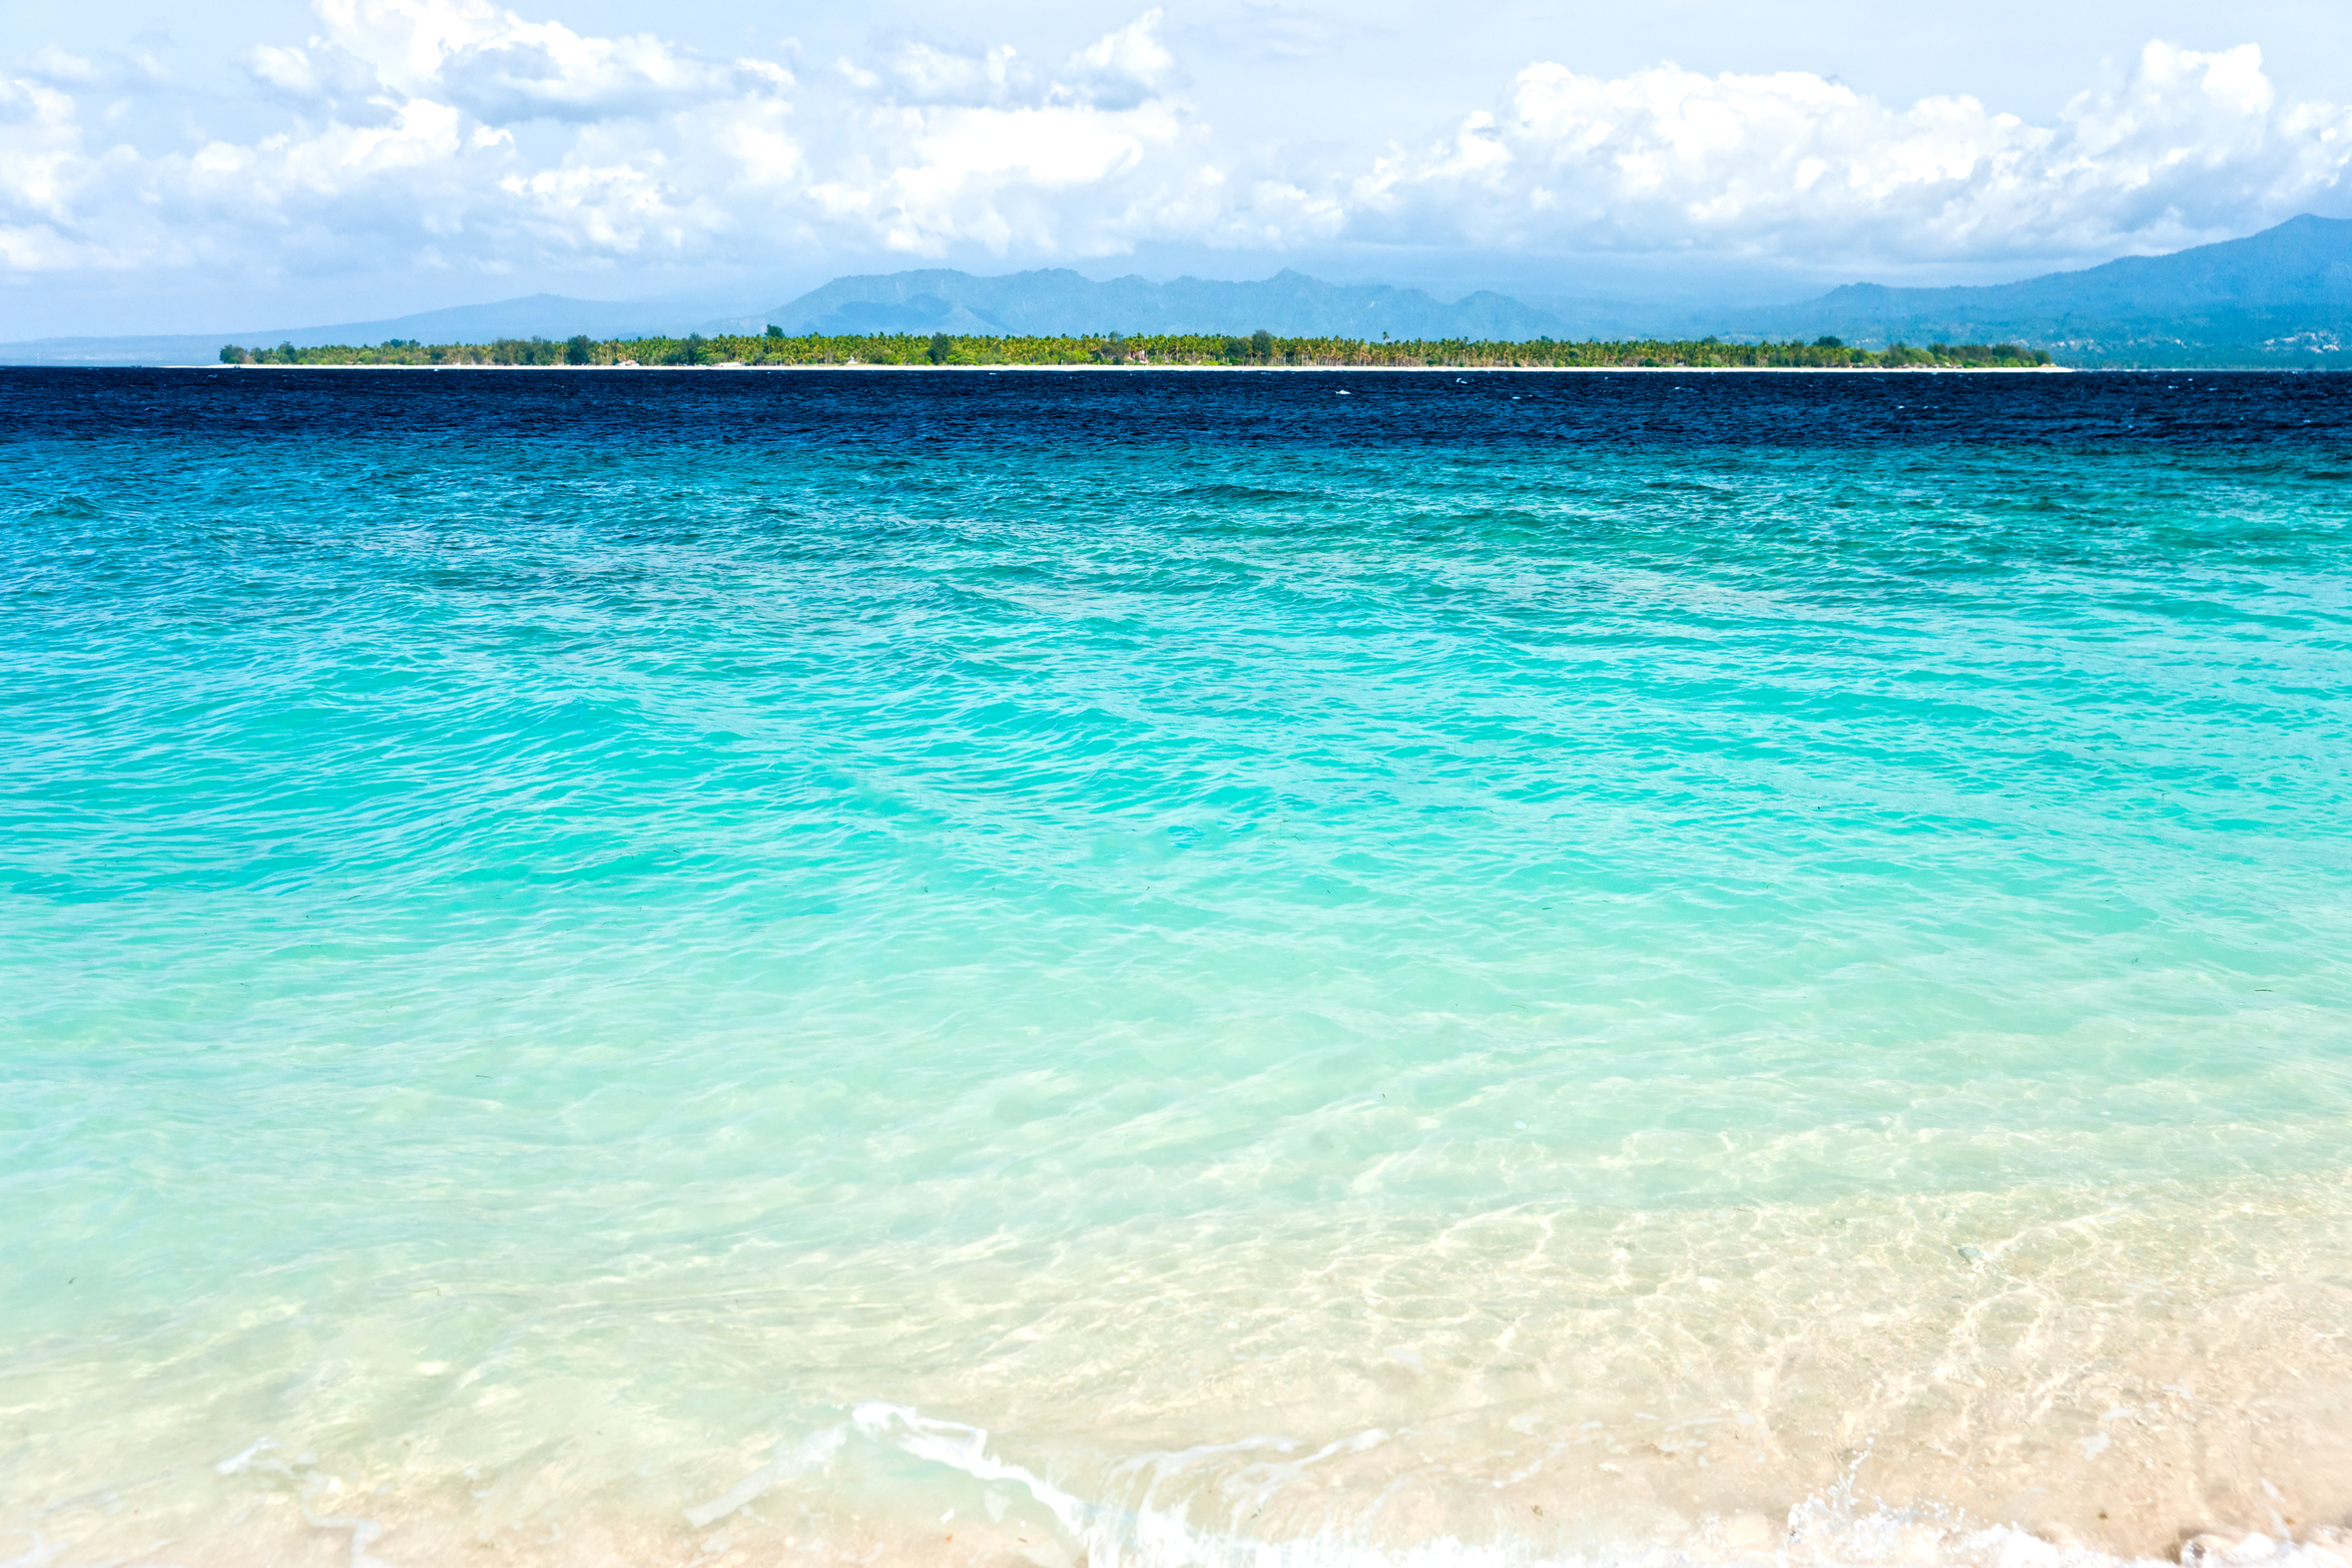 Gili Air Island from Gili Meno beach